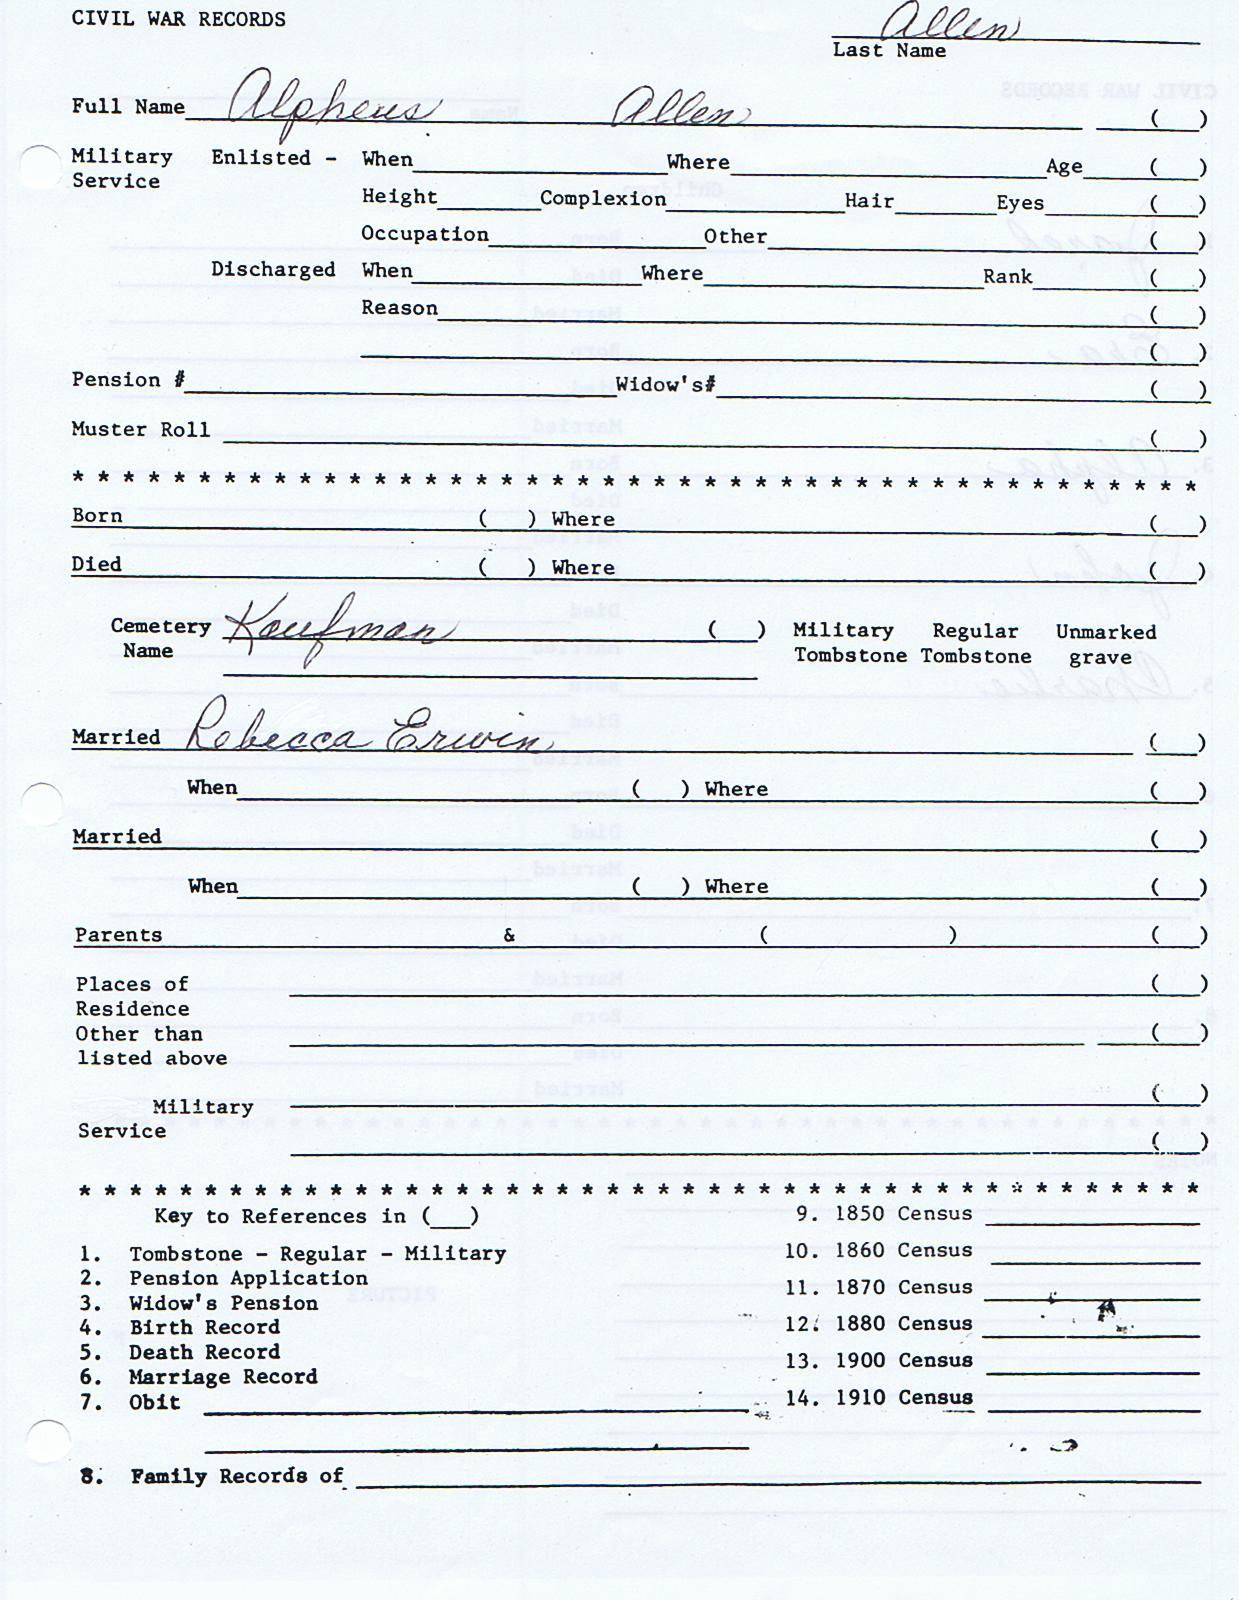 allen-kaufman_civil_war_records-3474